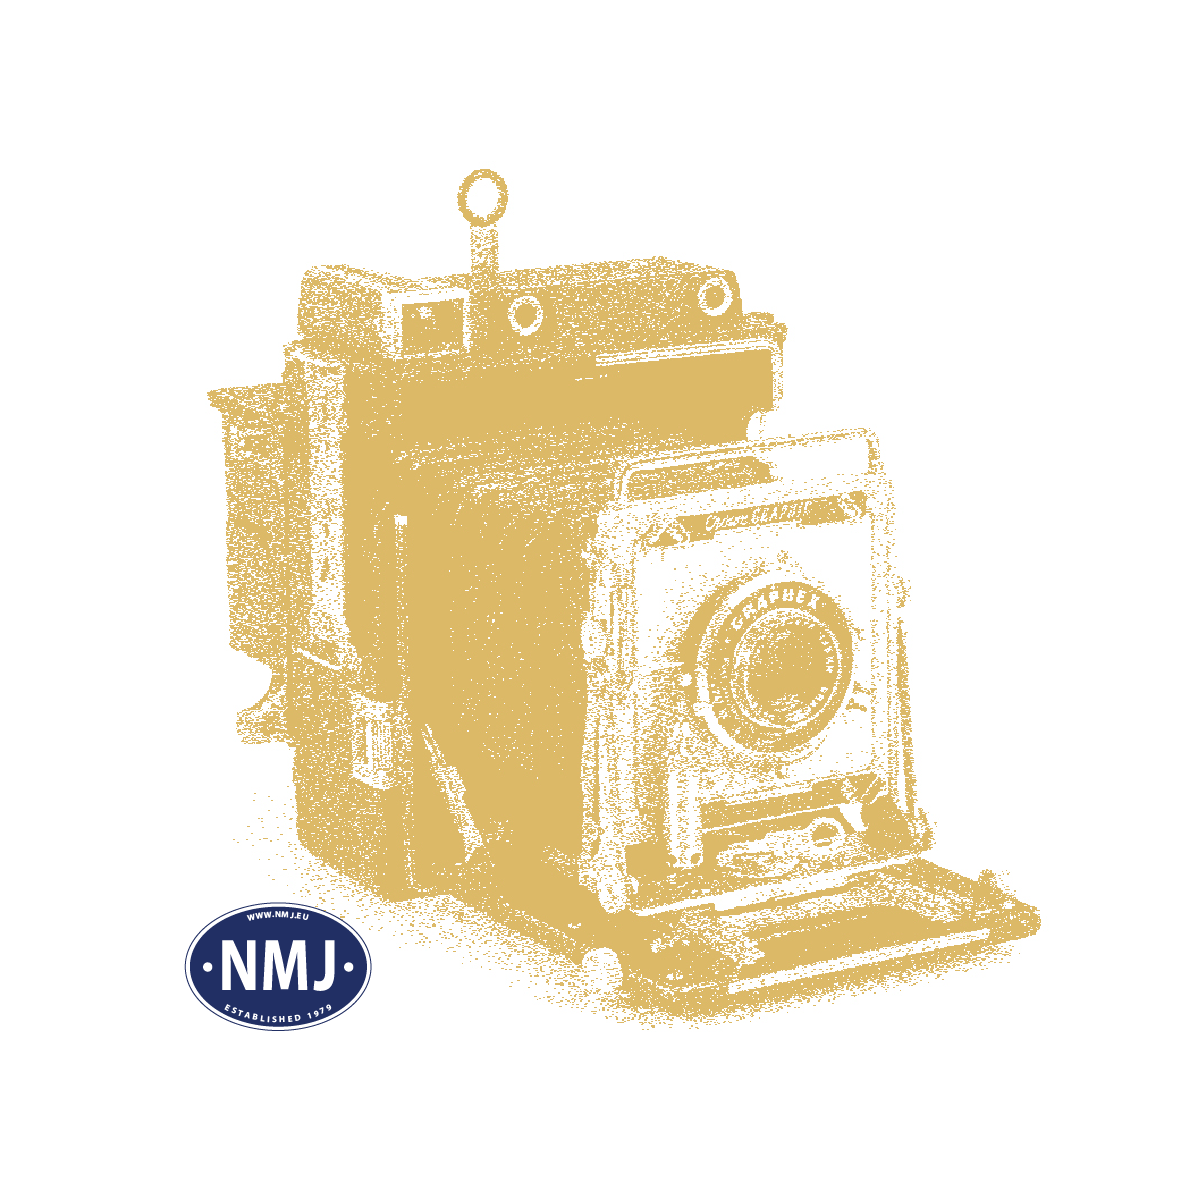 NMJH15115 - Norwegischer Bungalow, Rot / Weiß, H0 Fertigmodell